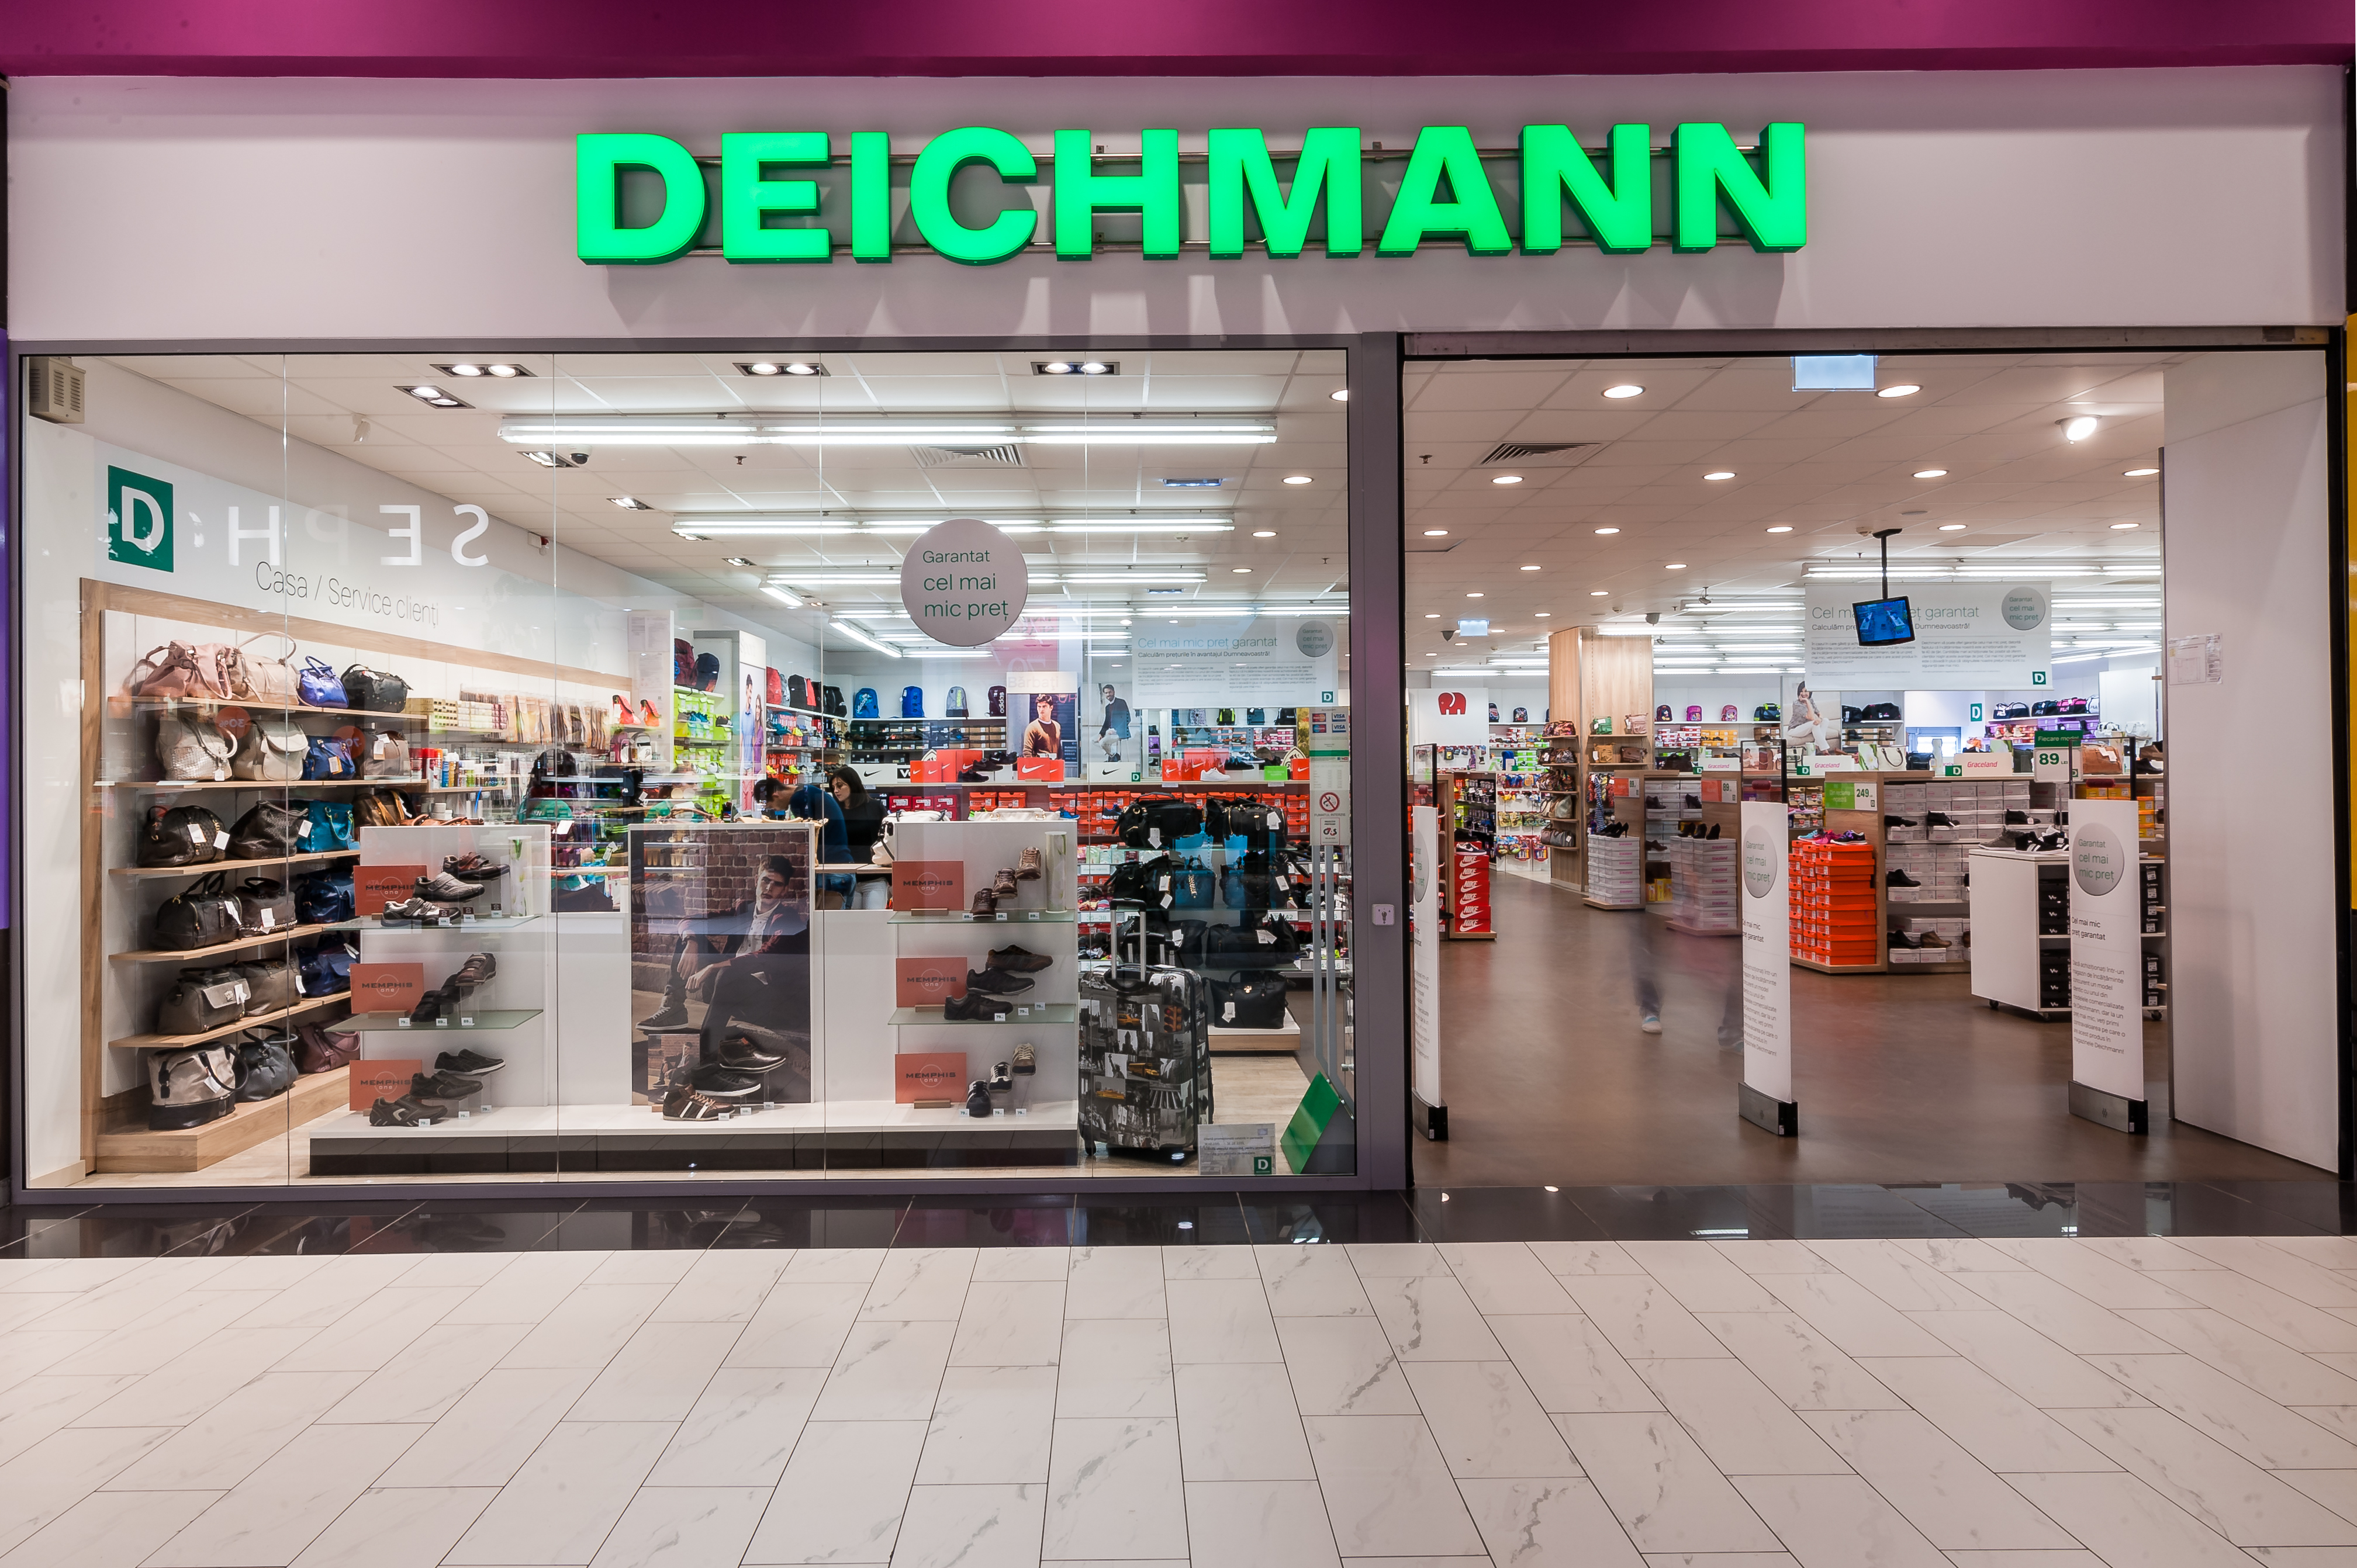 Deicgmann